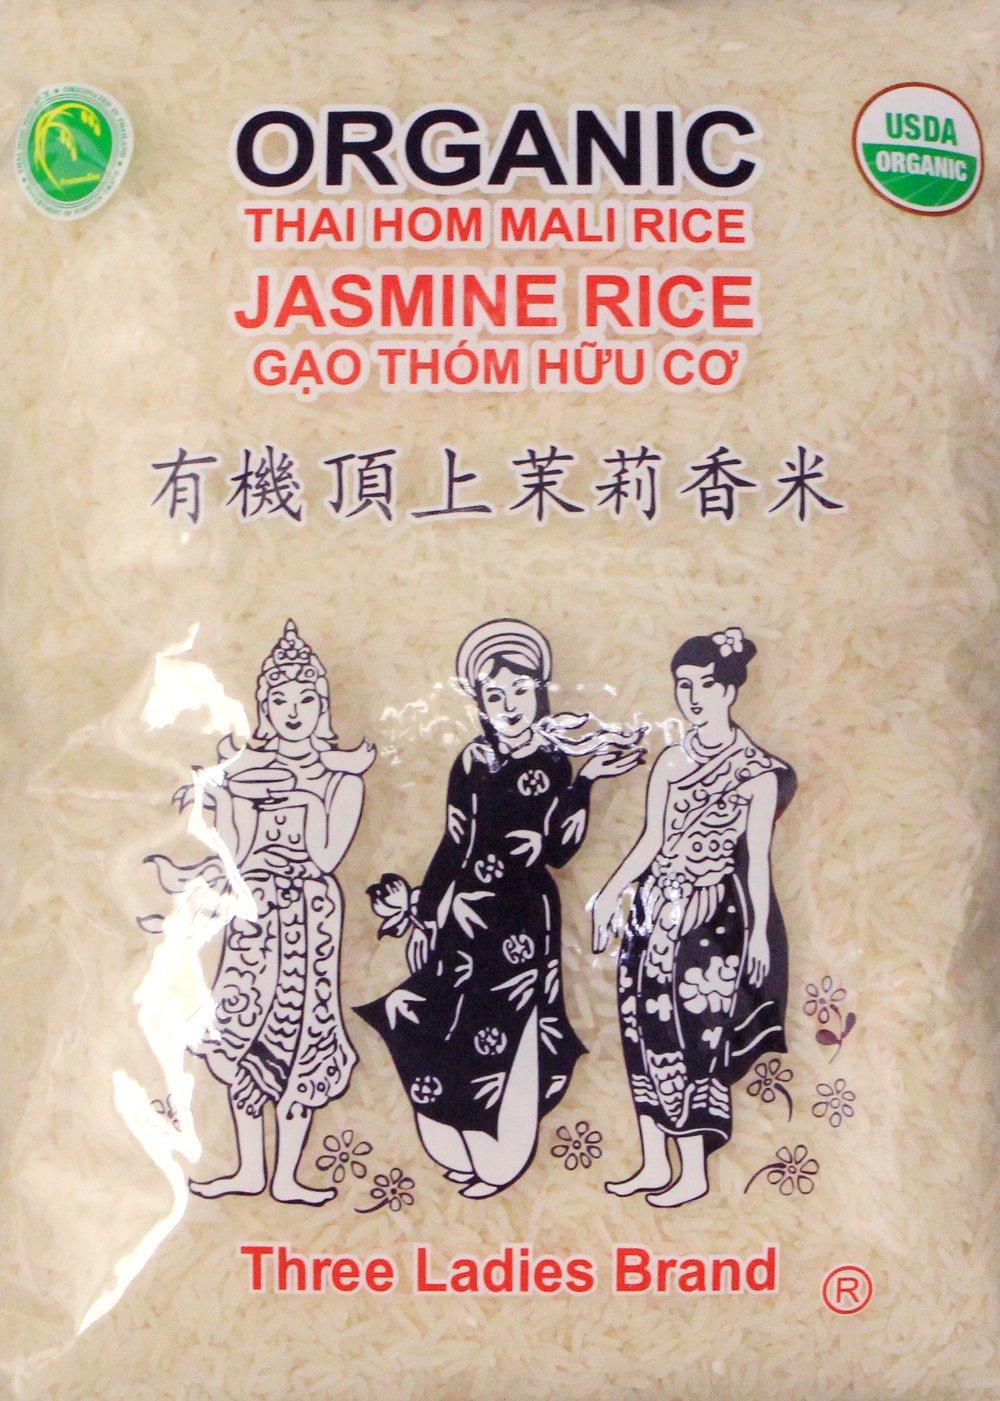 有機頂上茉莉香米USDA organic Three Ladies Thai Jasmine Rice Long Grain 5 lbs